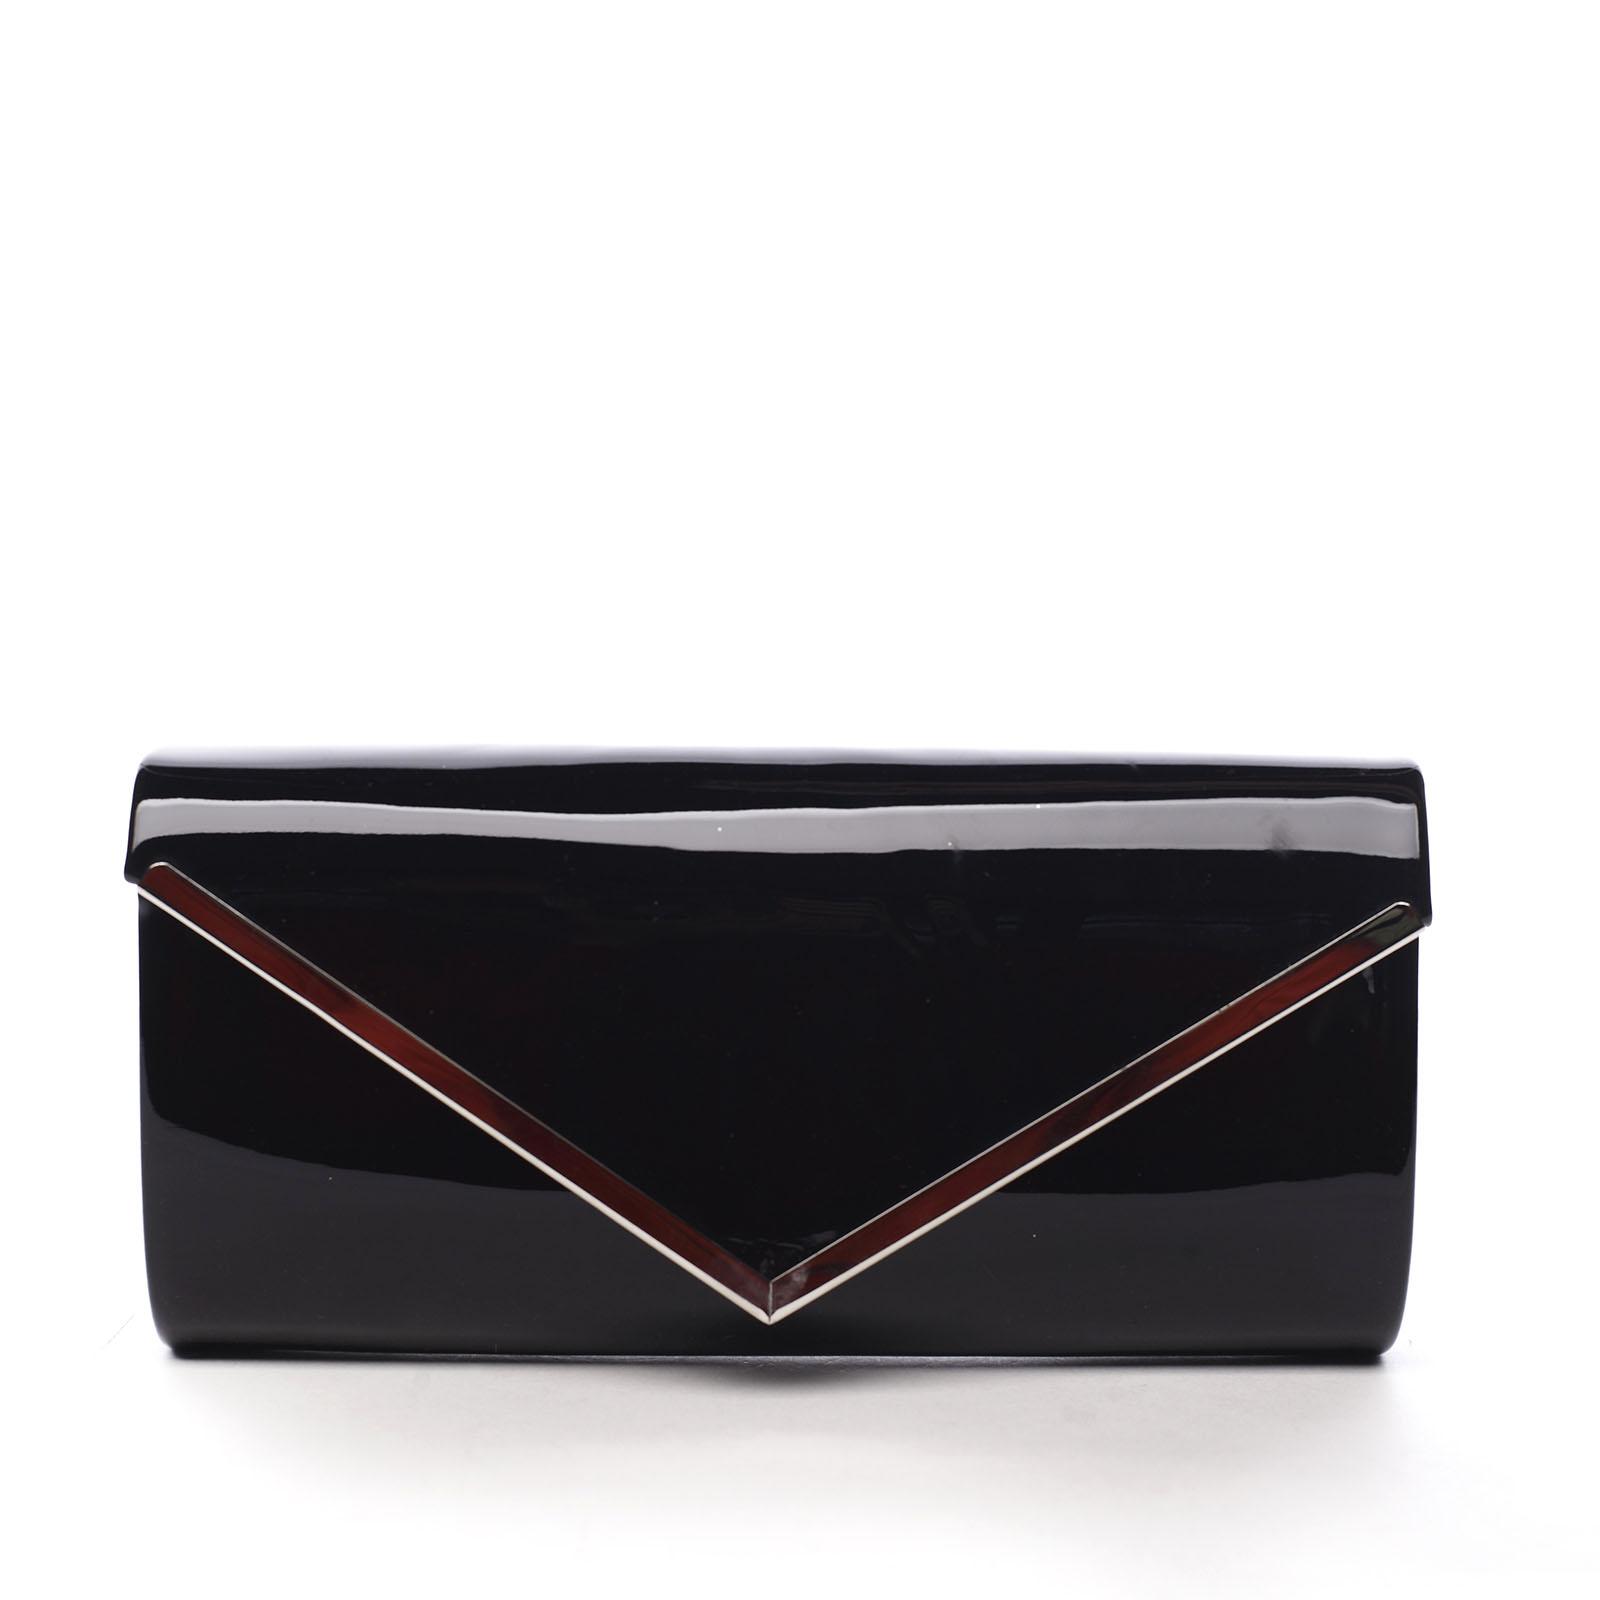 Dámska lakovaná listová kabelka čierna - Michelle Moon None čierna